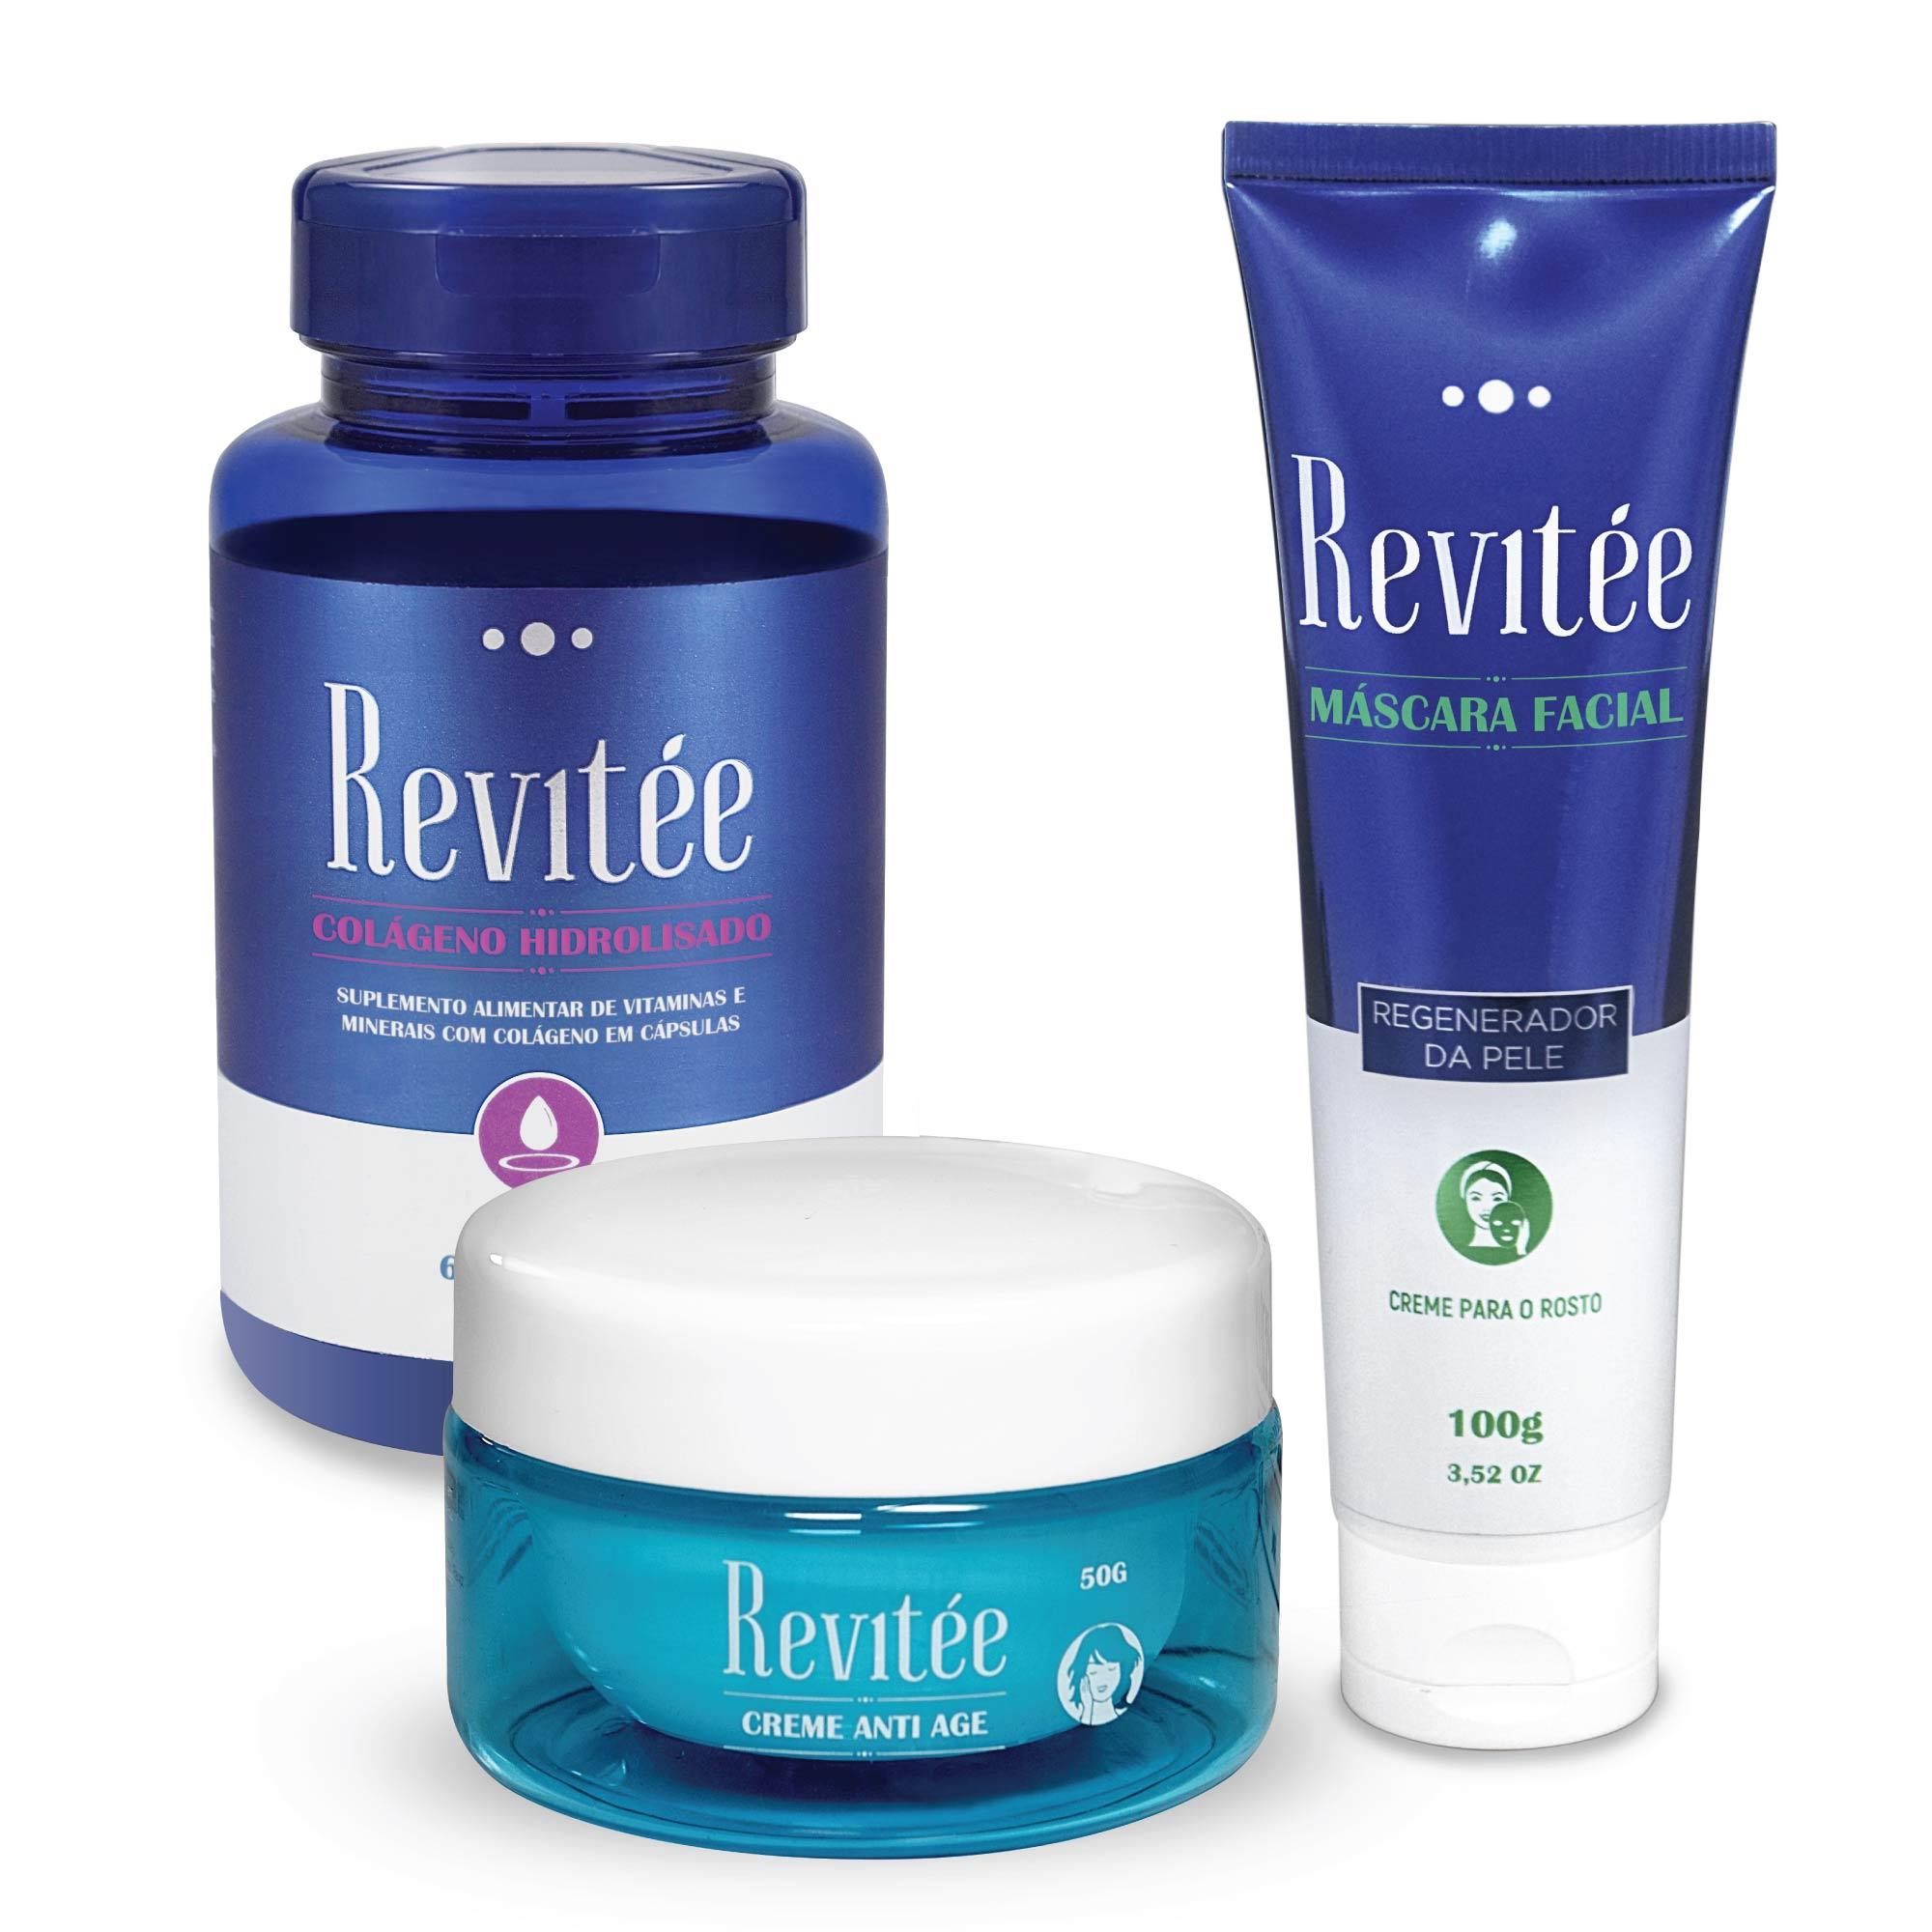 Skin Care + Colágeno